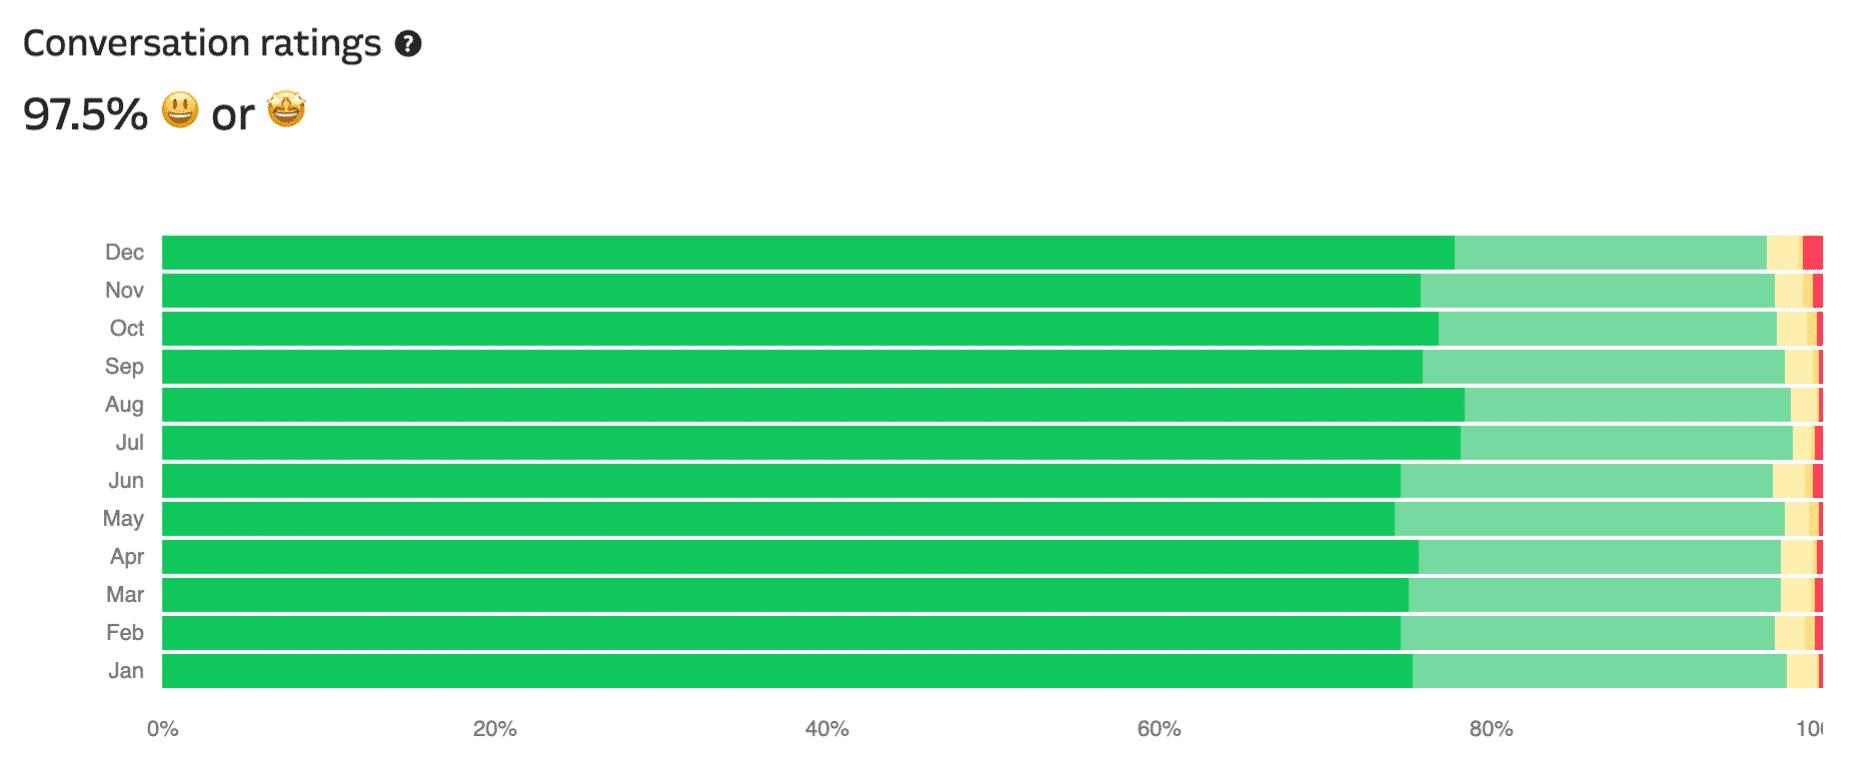 Kinsta's WordPress hosting support conversation ratings chart.